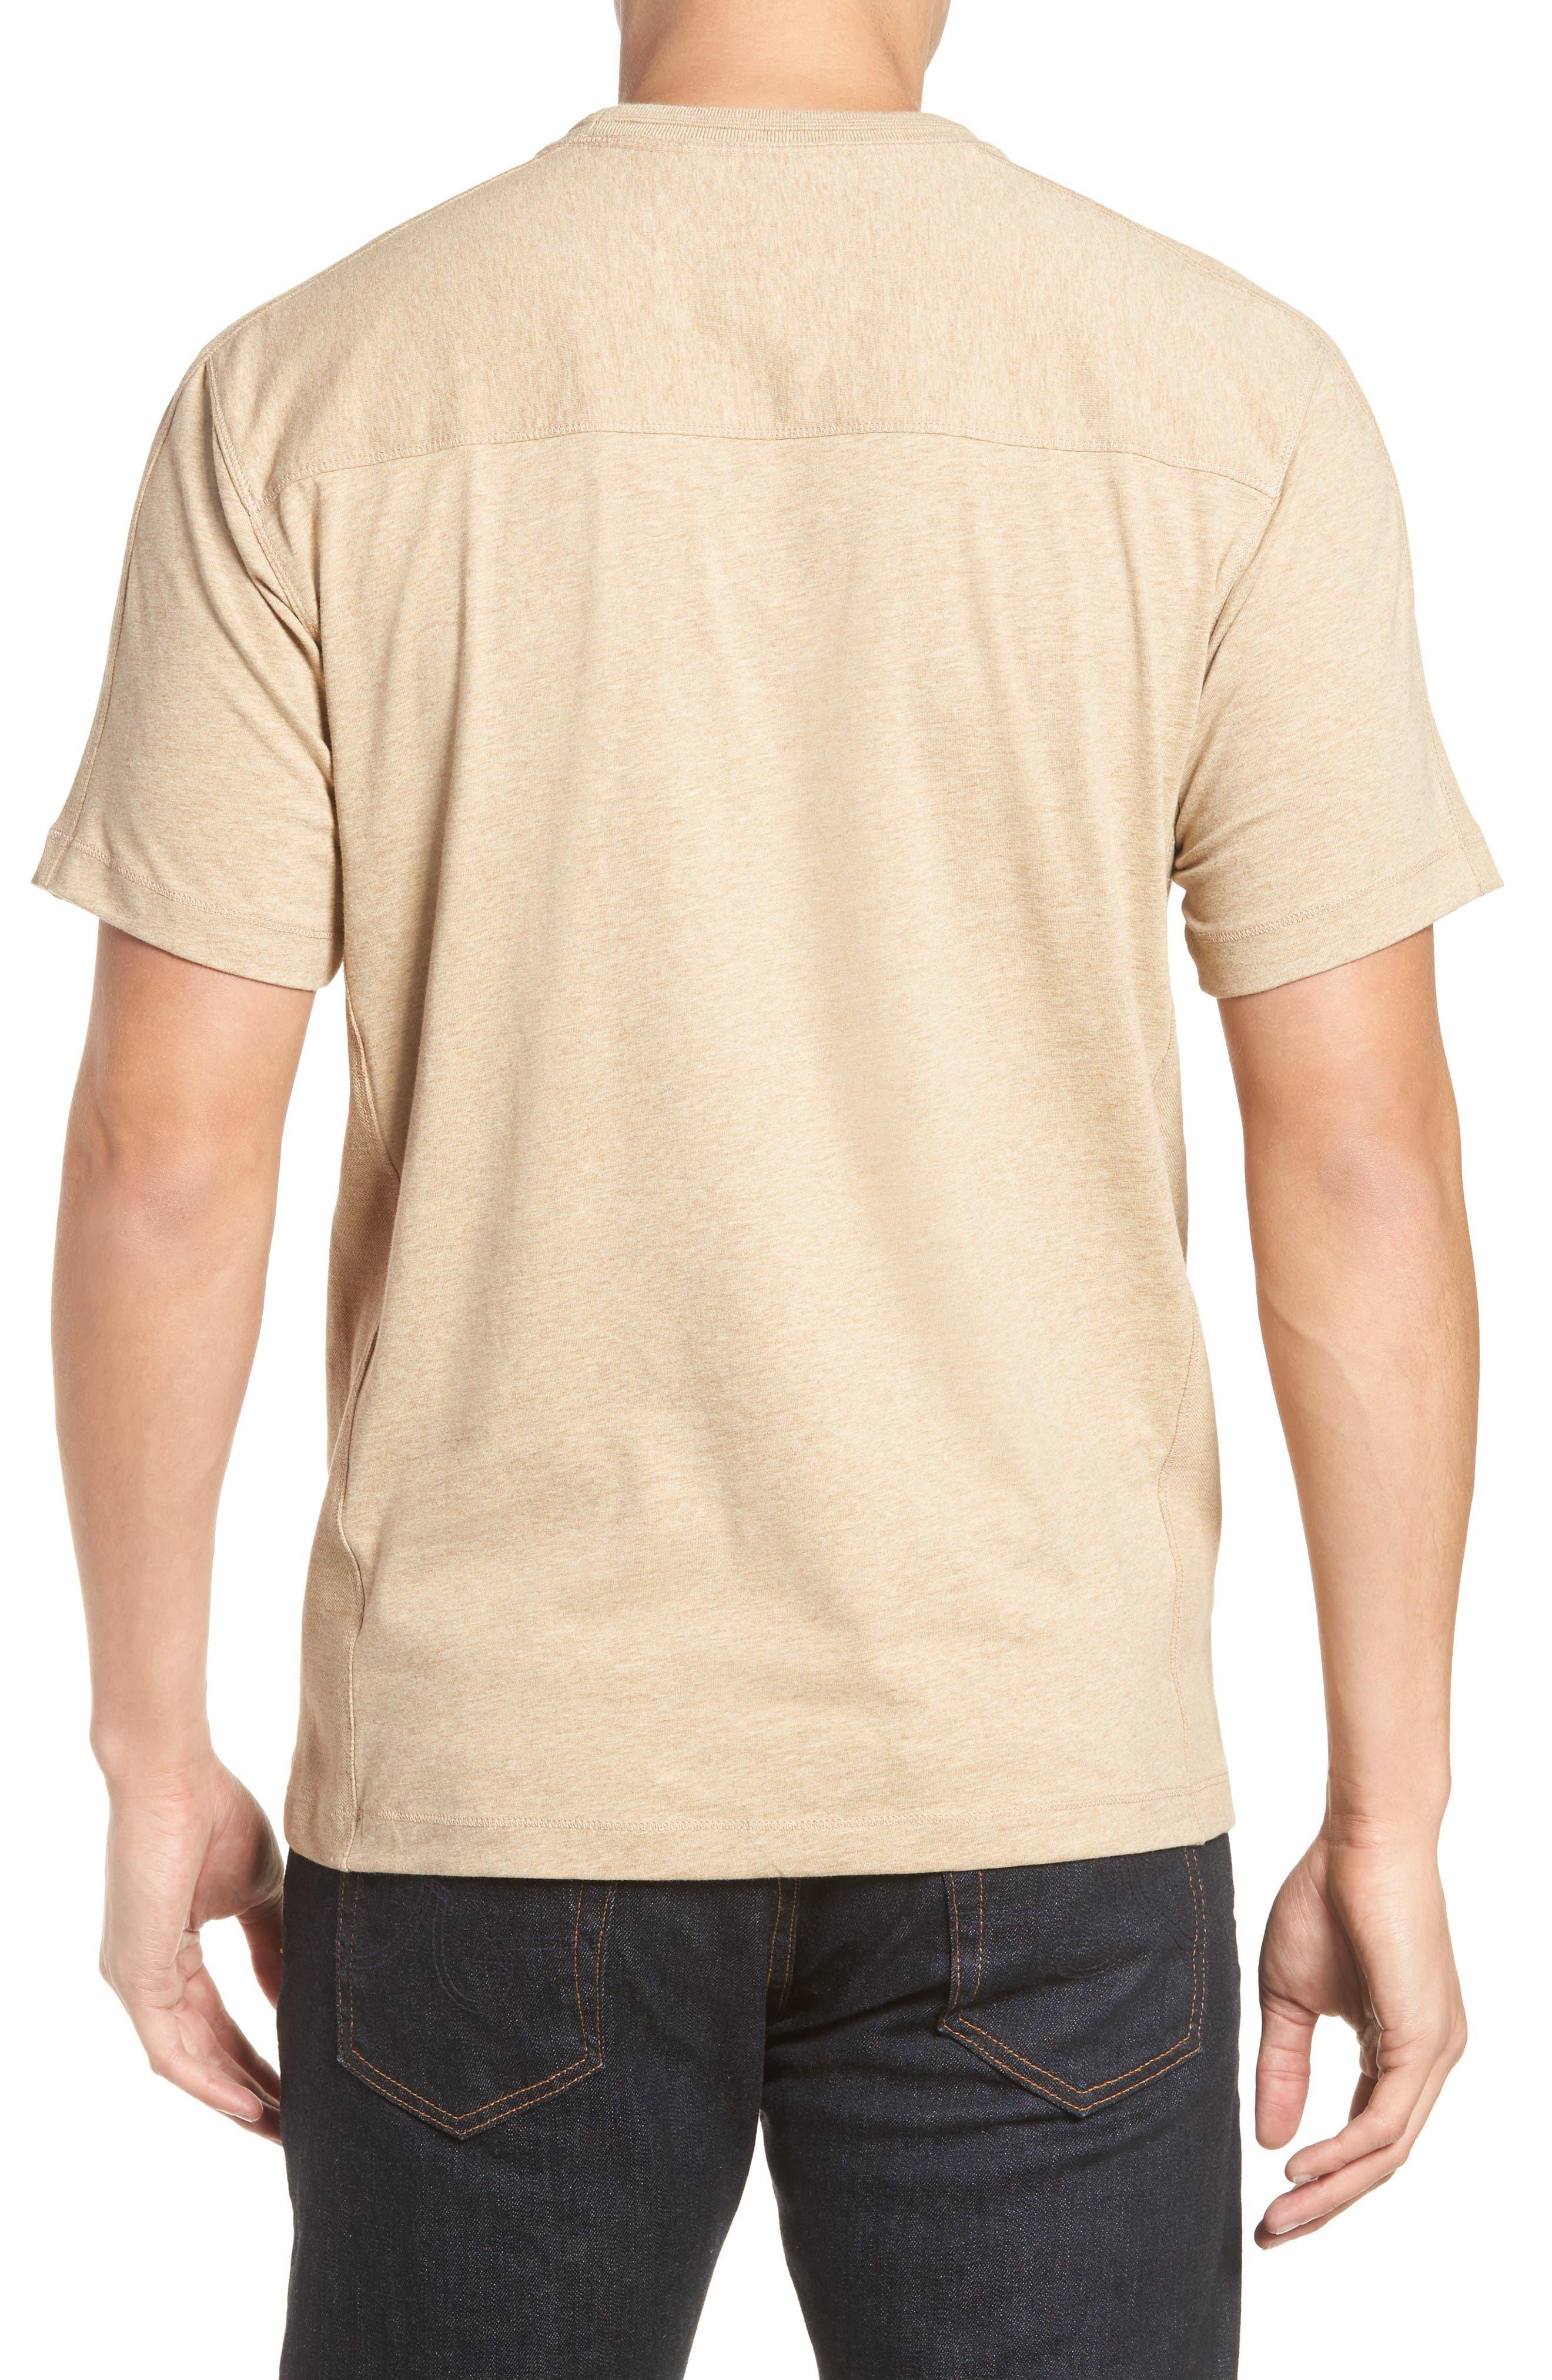 Alternate Image 2  - Thaddeus Steve Stretch Jersey T-Shirt